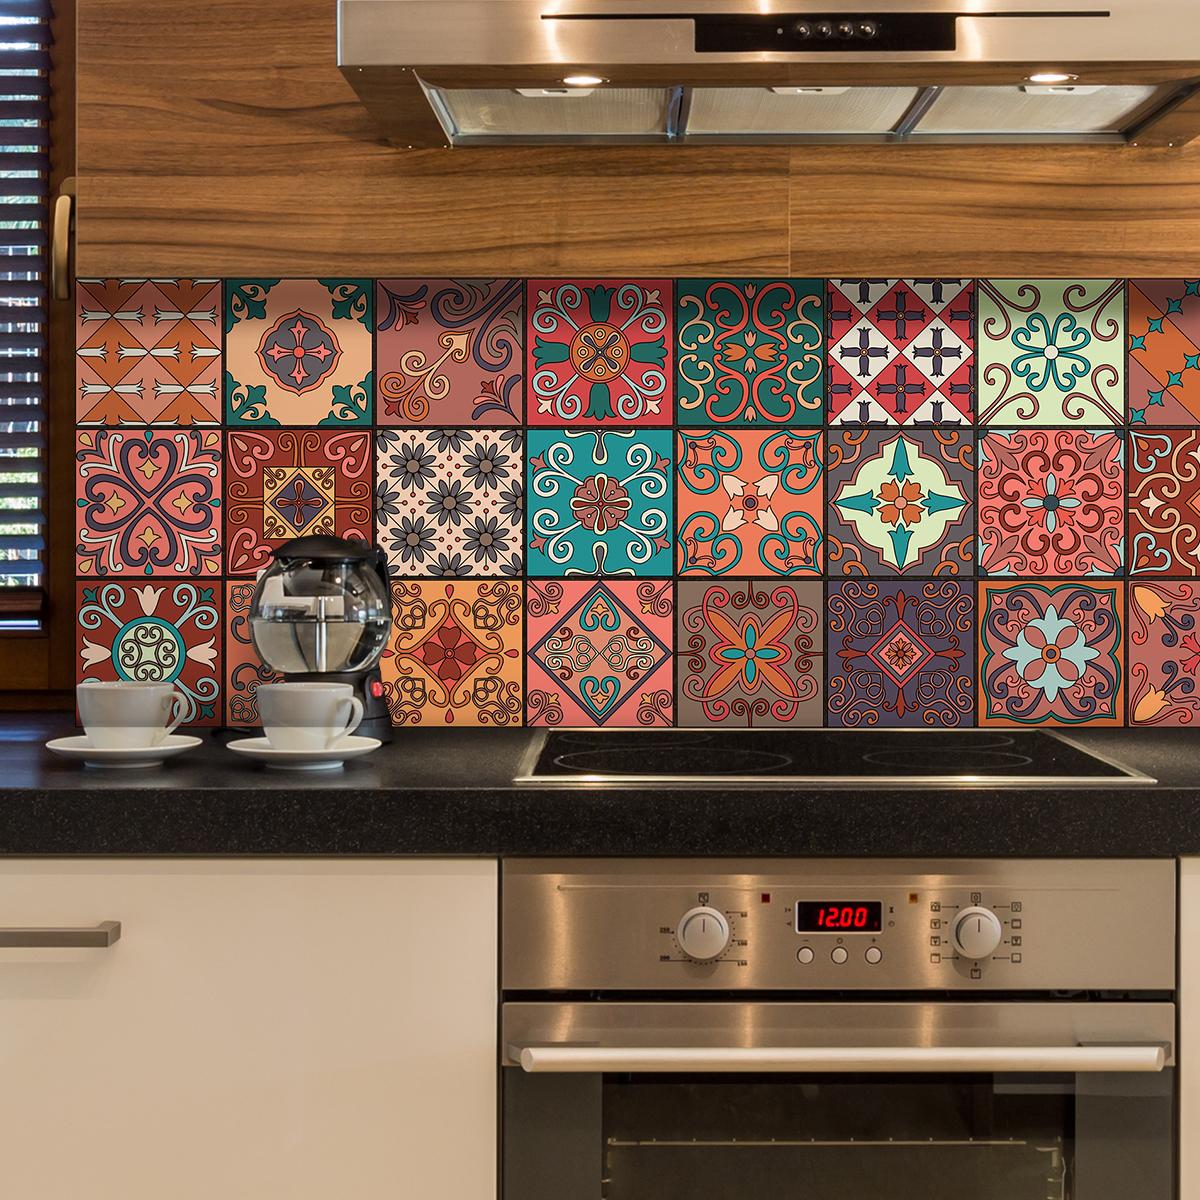 24 stickers carreaux de ciment azulejos giordano cuisine. Black Bedroom Furniture Sets. Home Design Ideas